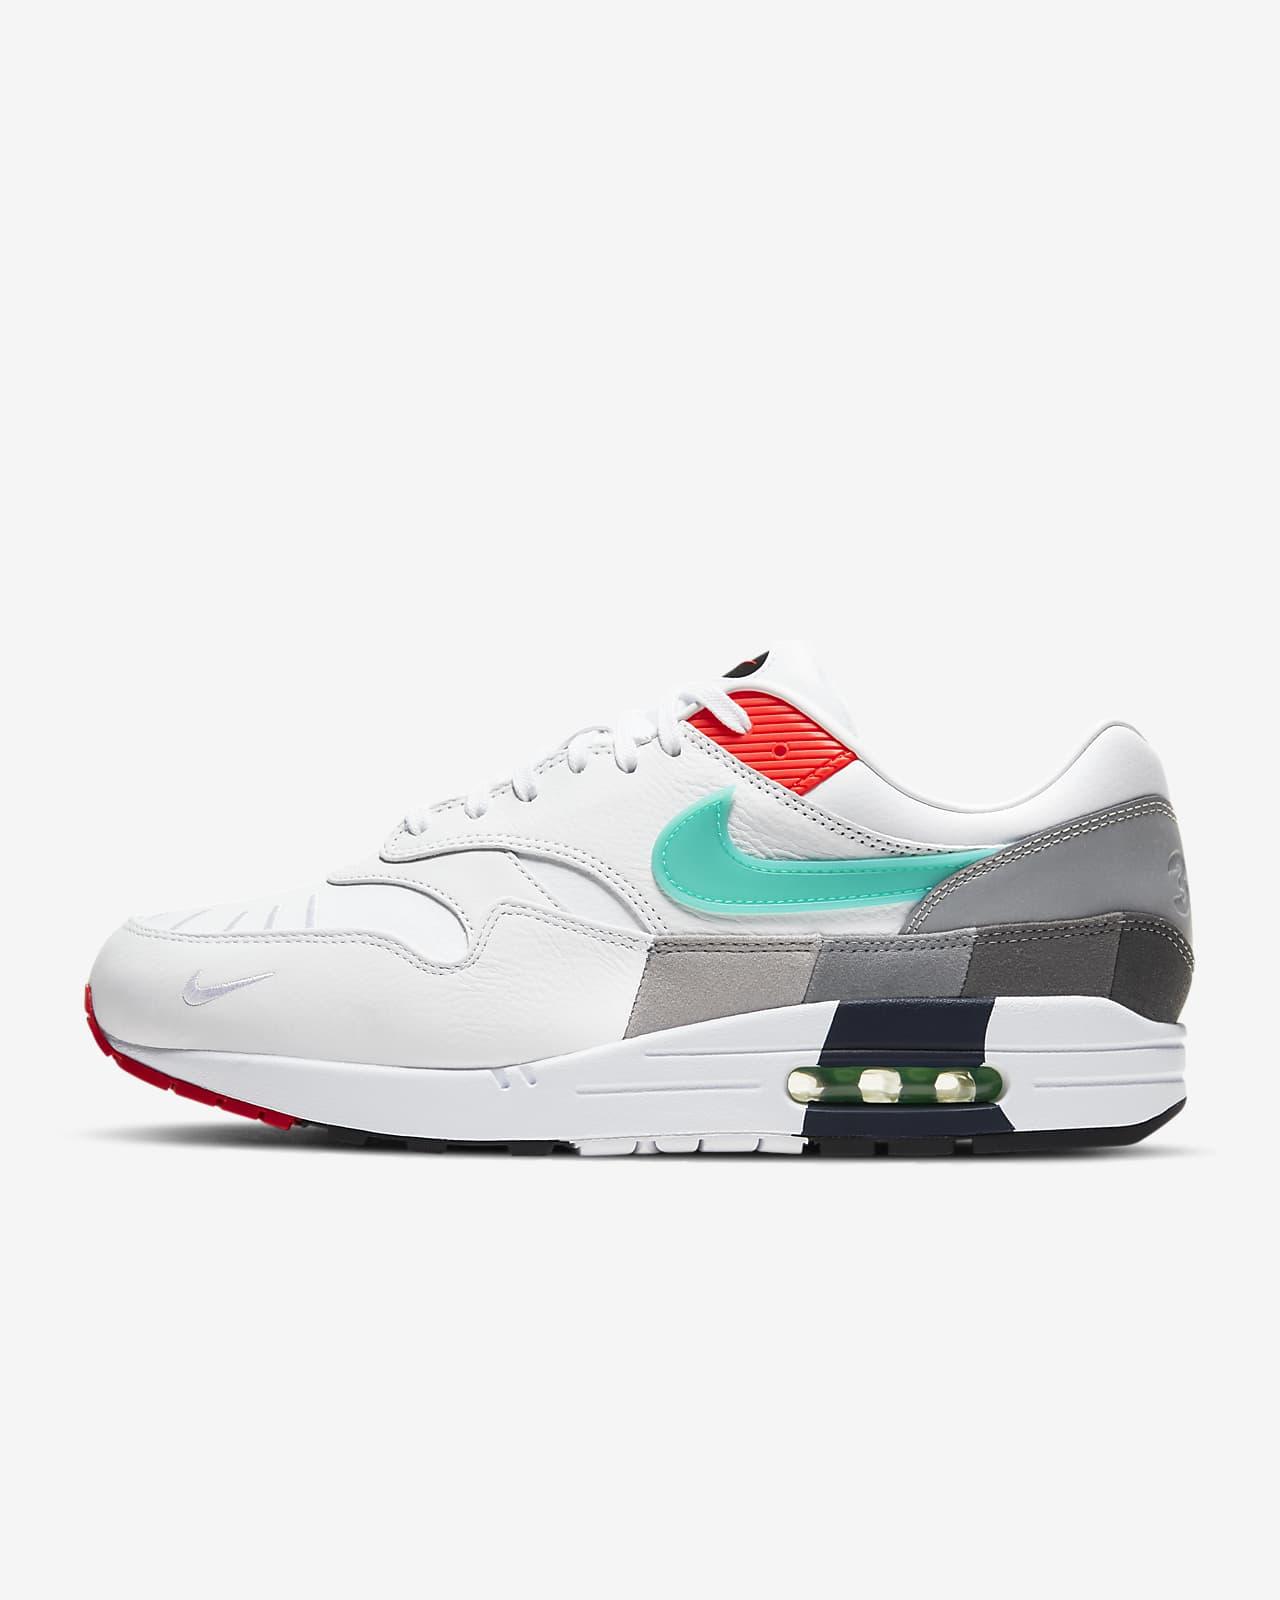 Nike Air Max 1 EOI Men's Shoes